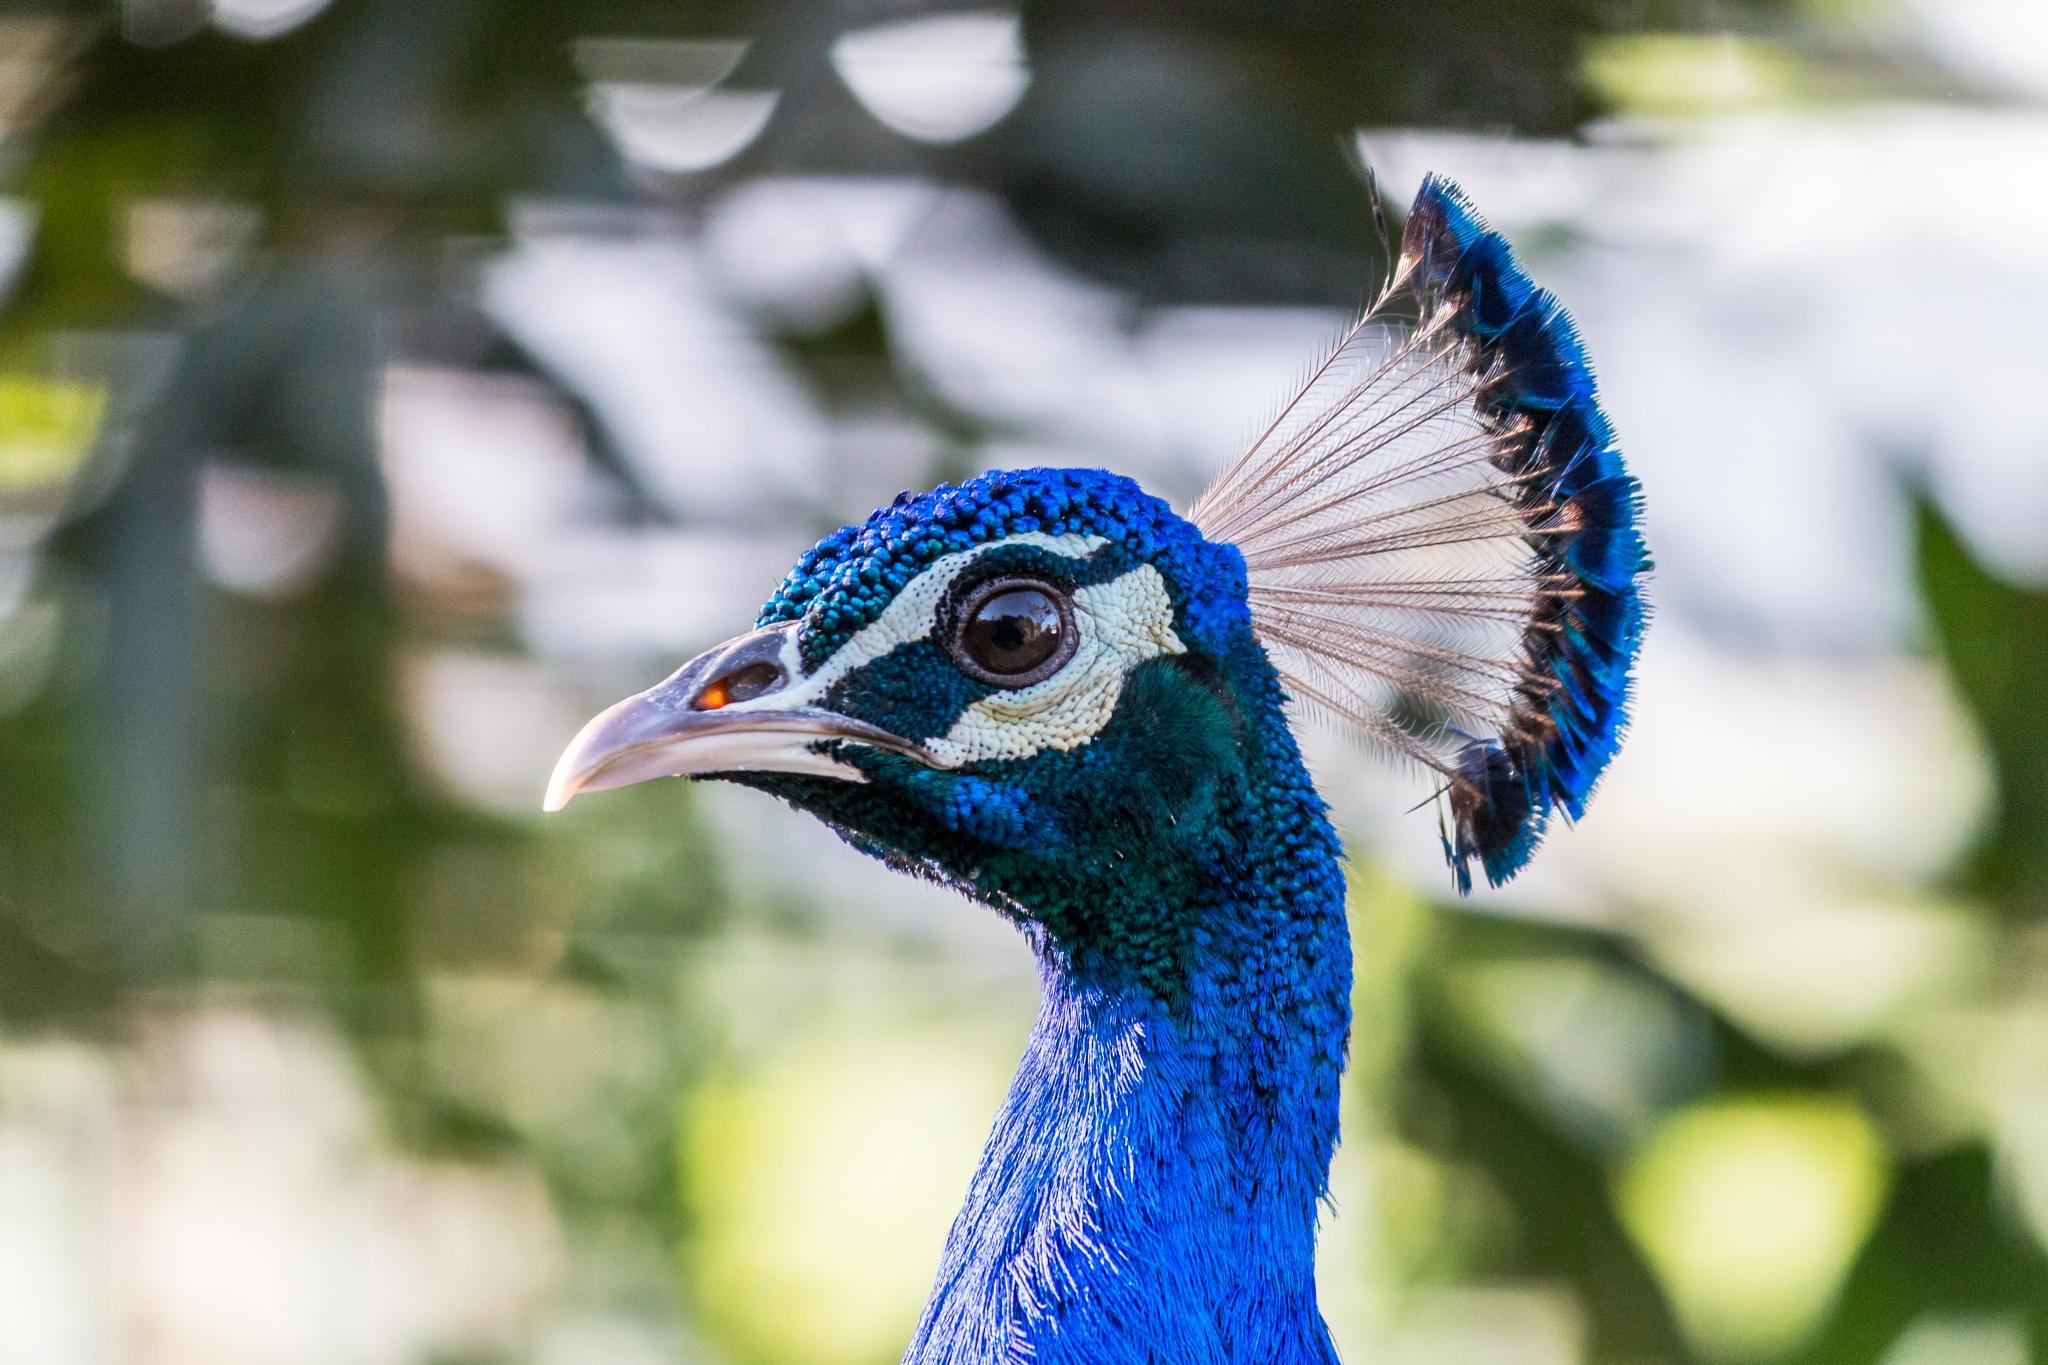 Indian peafowl (Indian Peacock male) by Brijesh meena